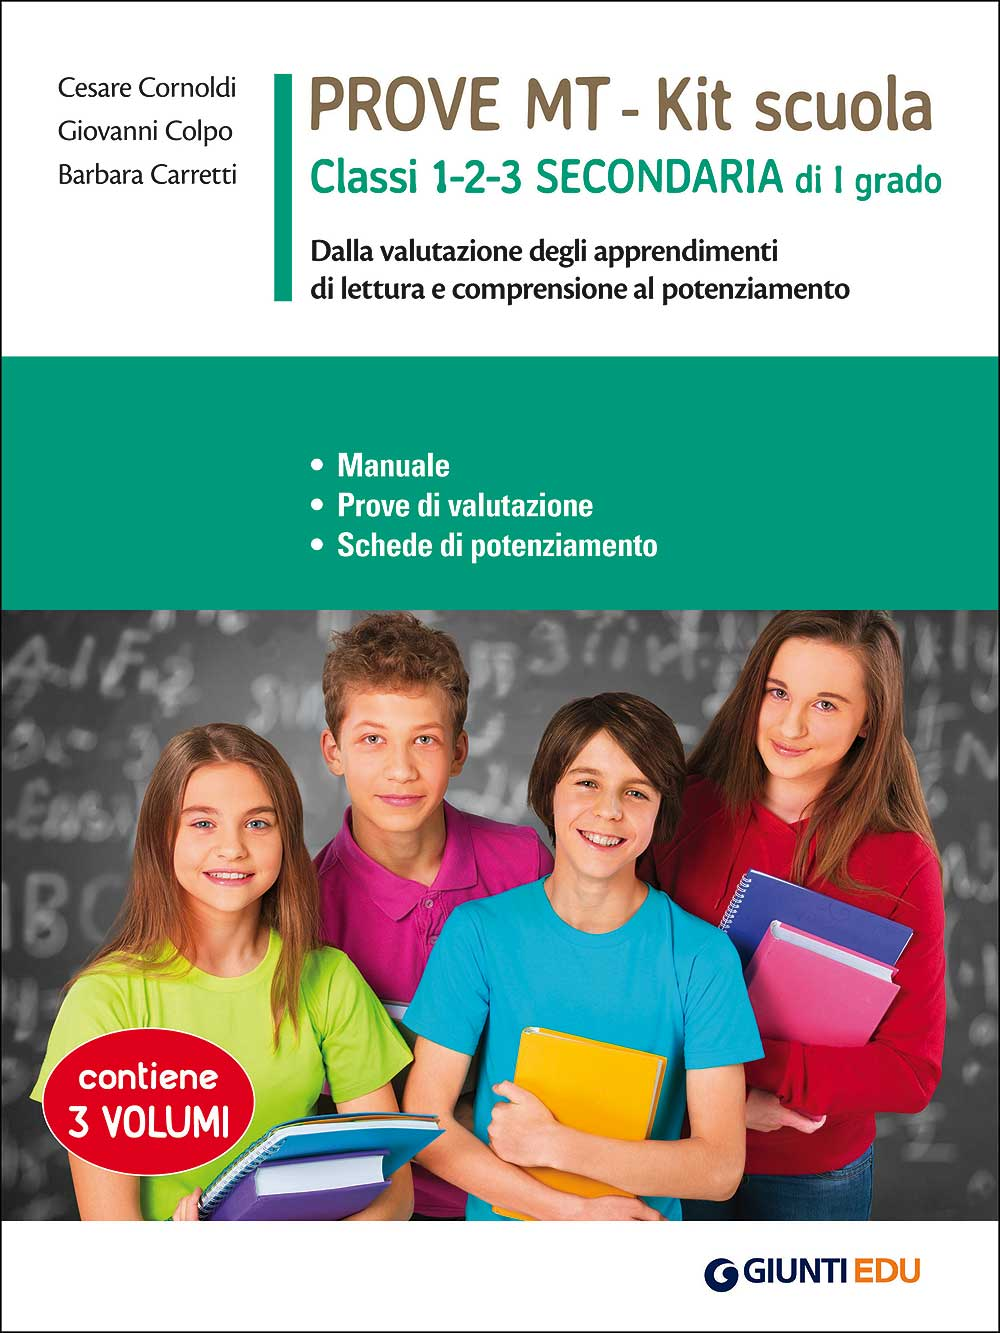 Prove MT 1-2-3 - Kit scuola secondaria di I grado